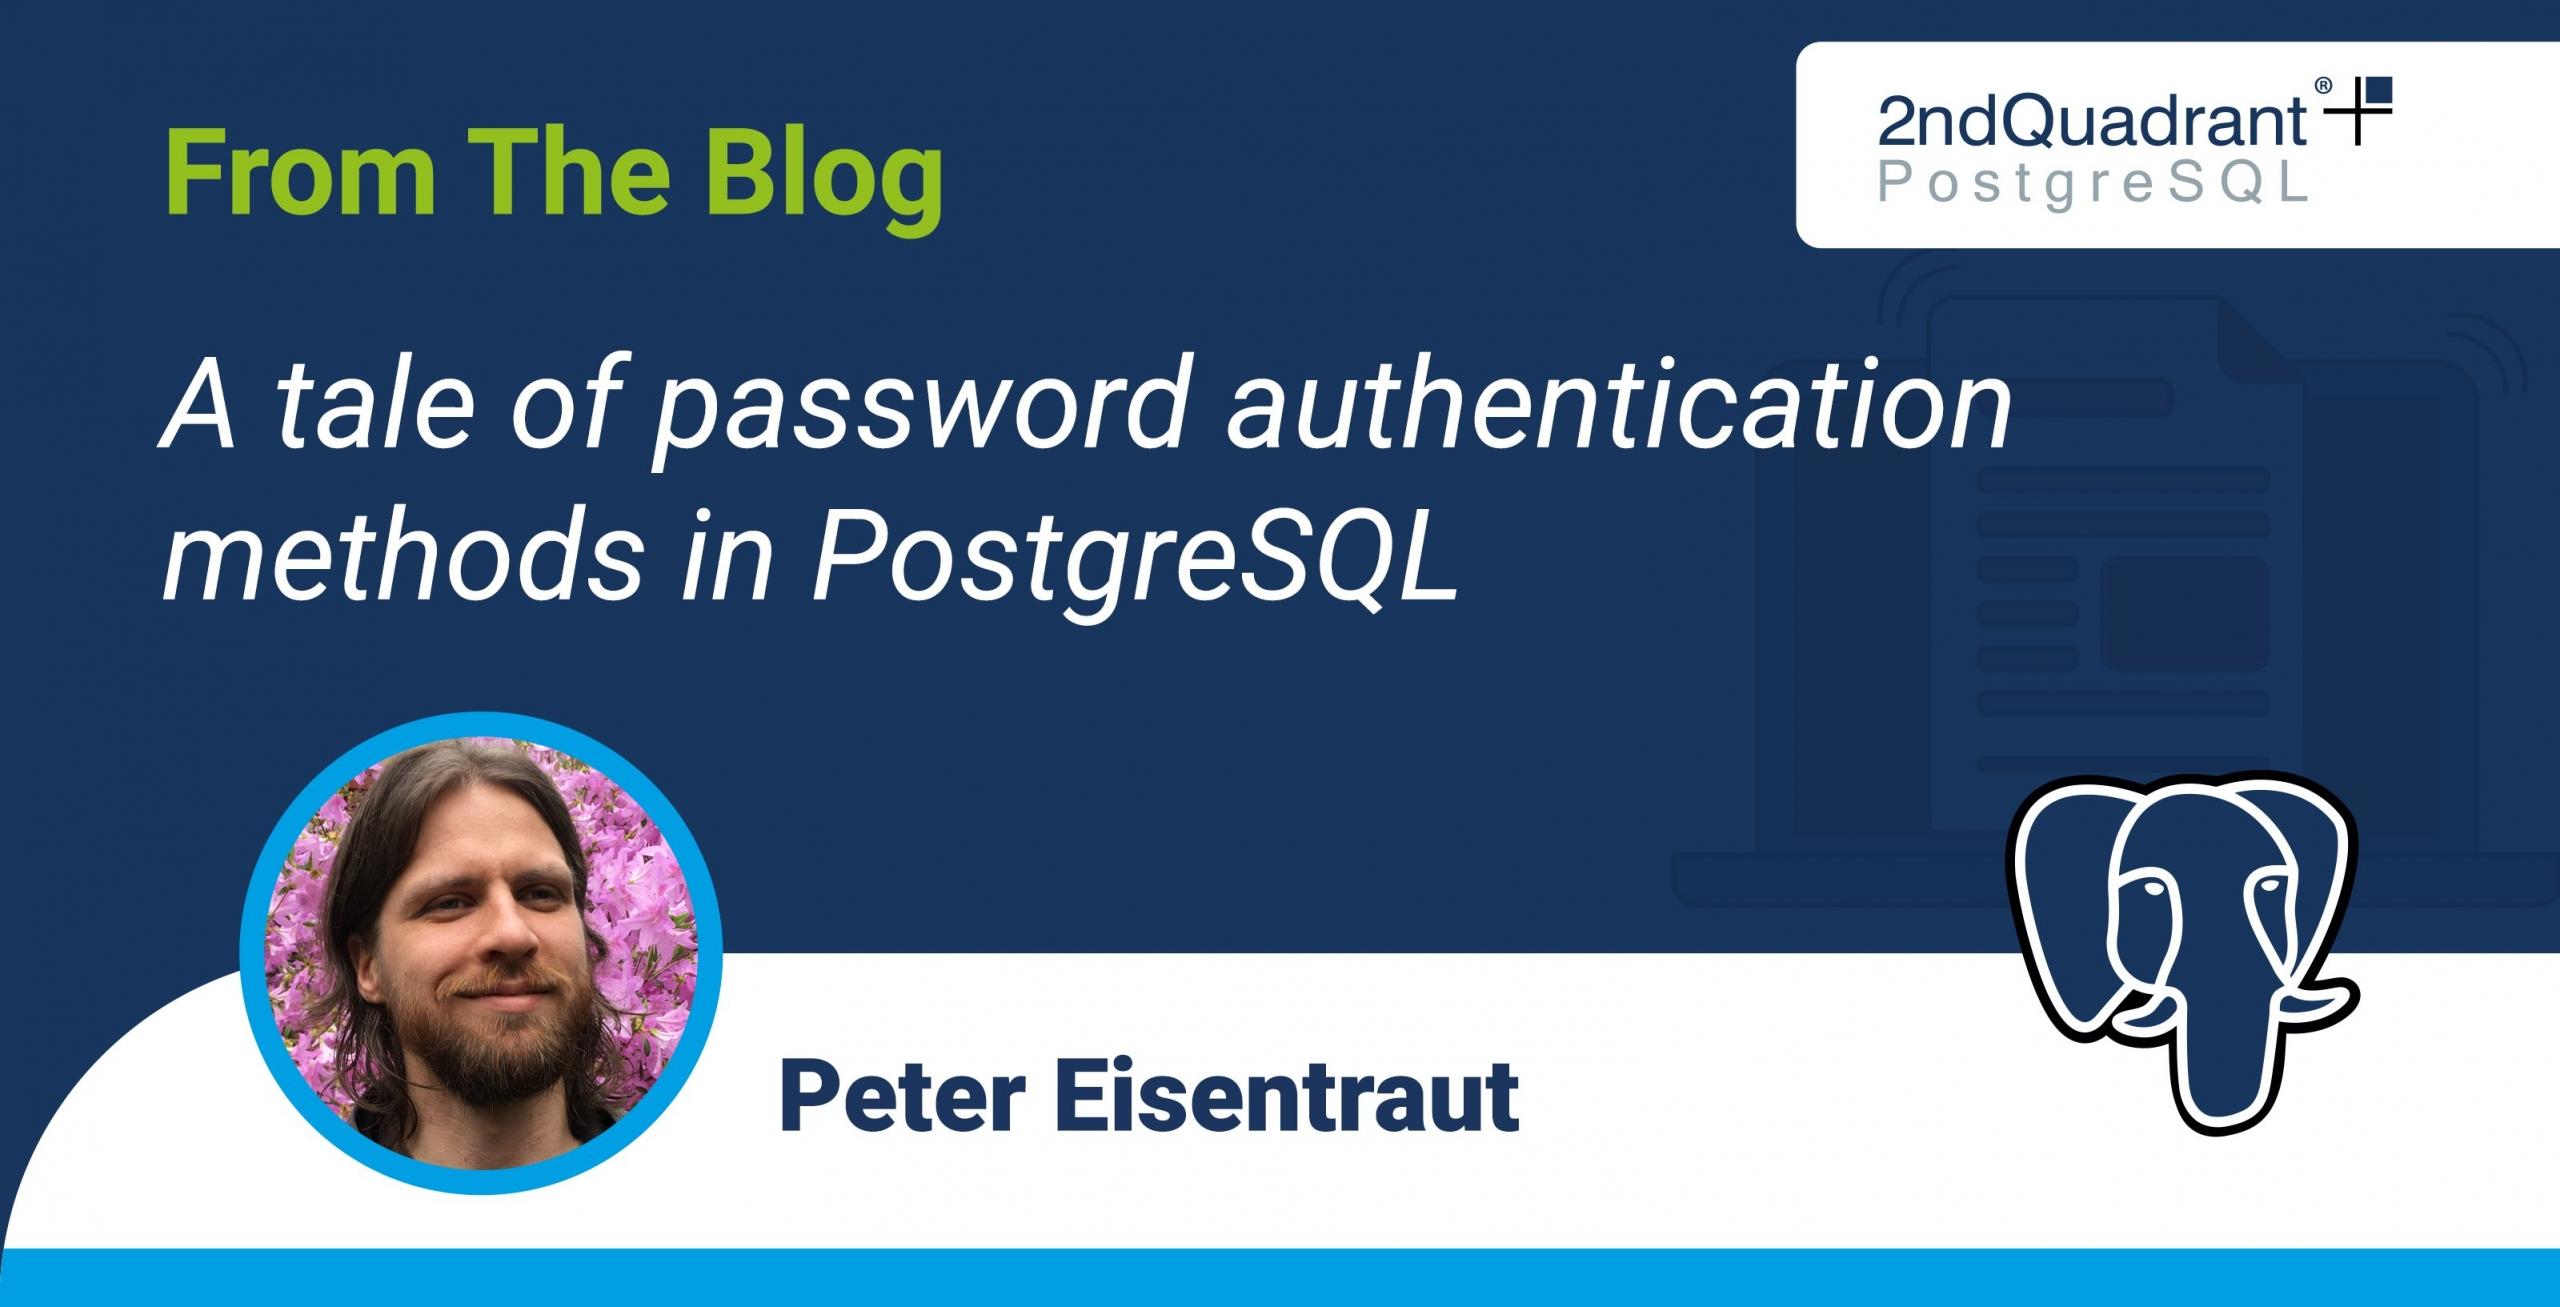 A tale of password authentication methods in PostgreSQL